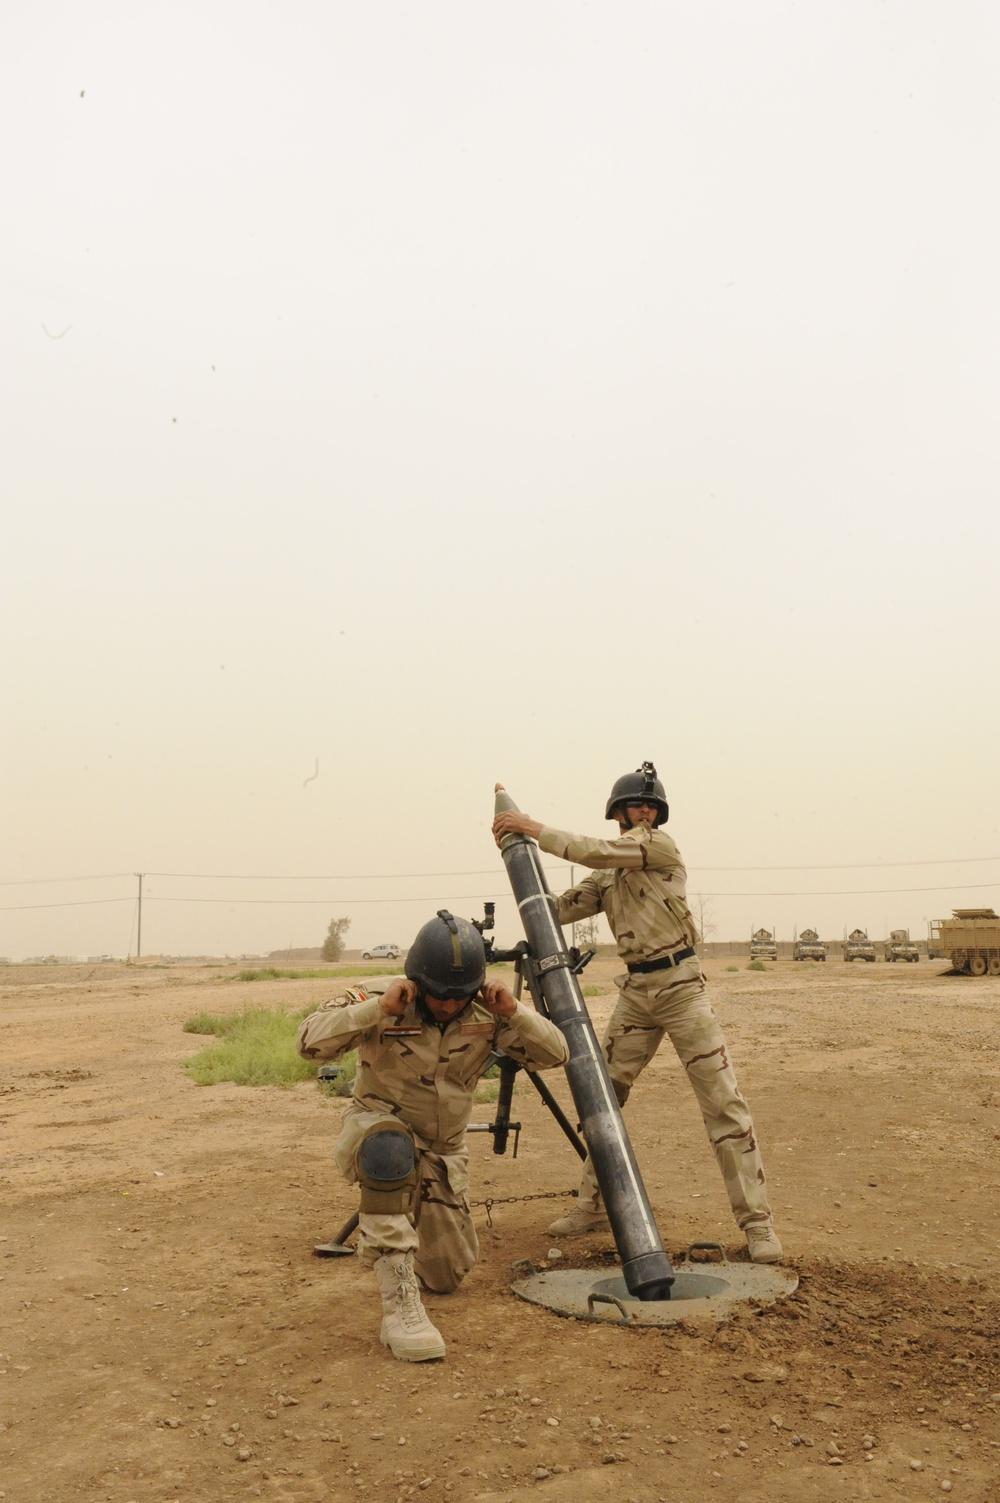 120 mm mortar training at Camp Taji